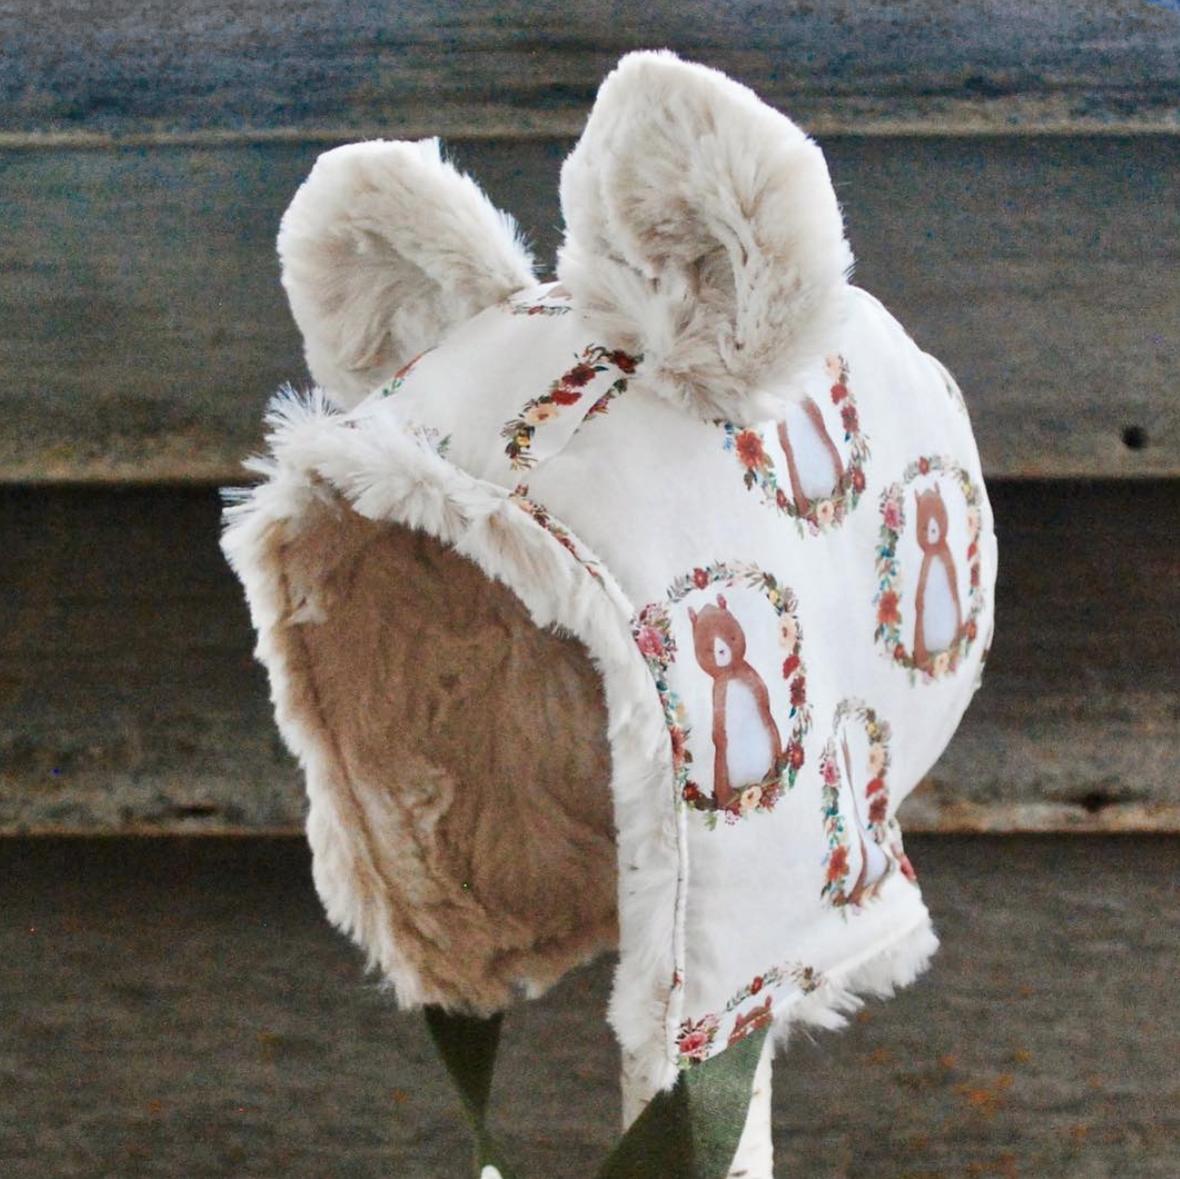 Hawthorne Supply Co Shopcabin Autumn Florals Bonnet by Eddie and Sophia